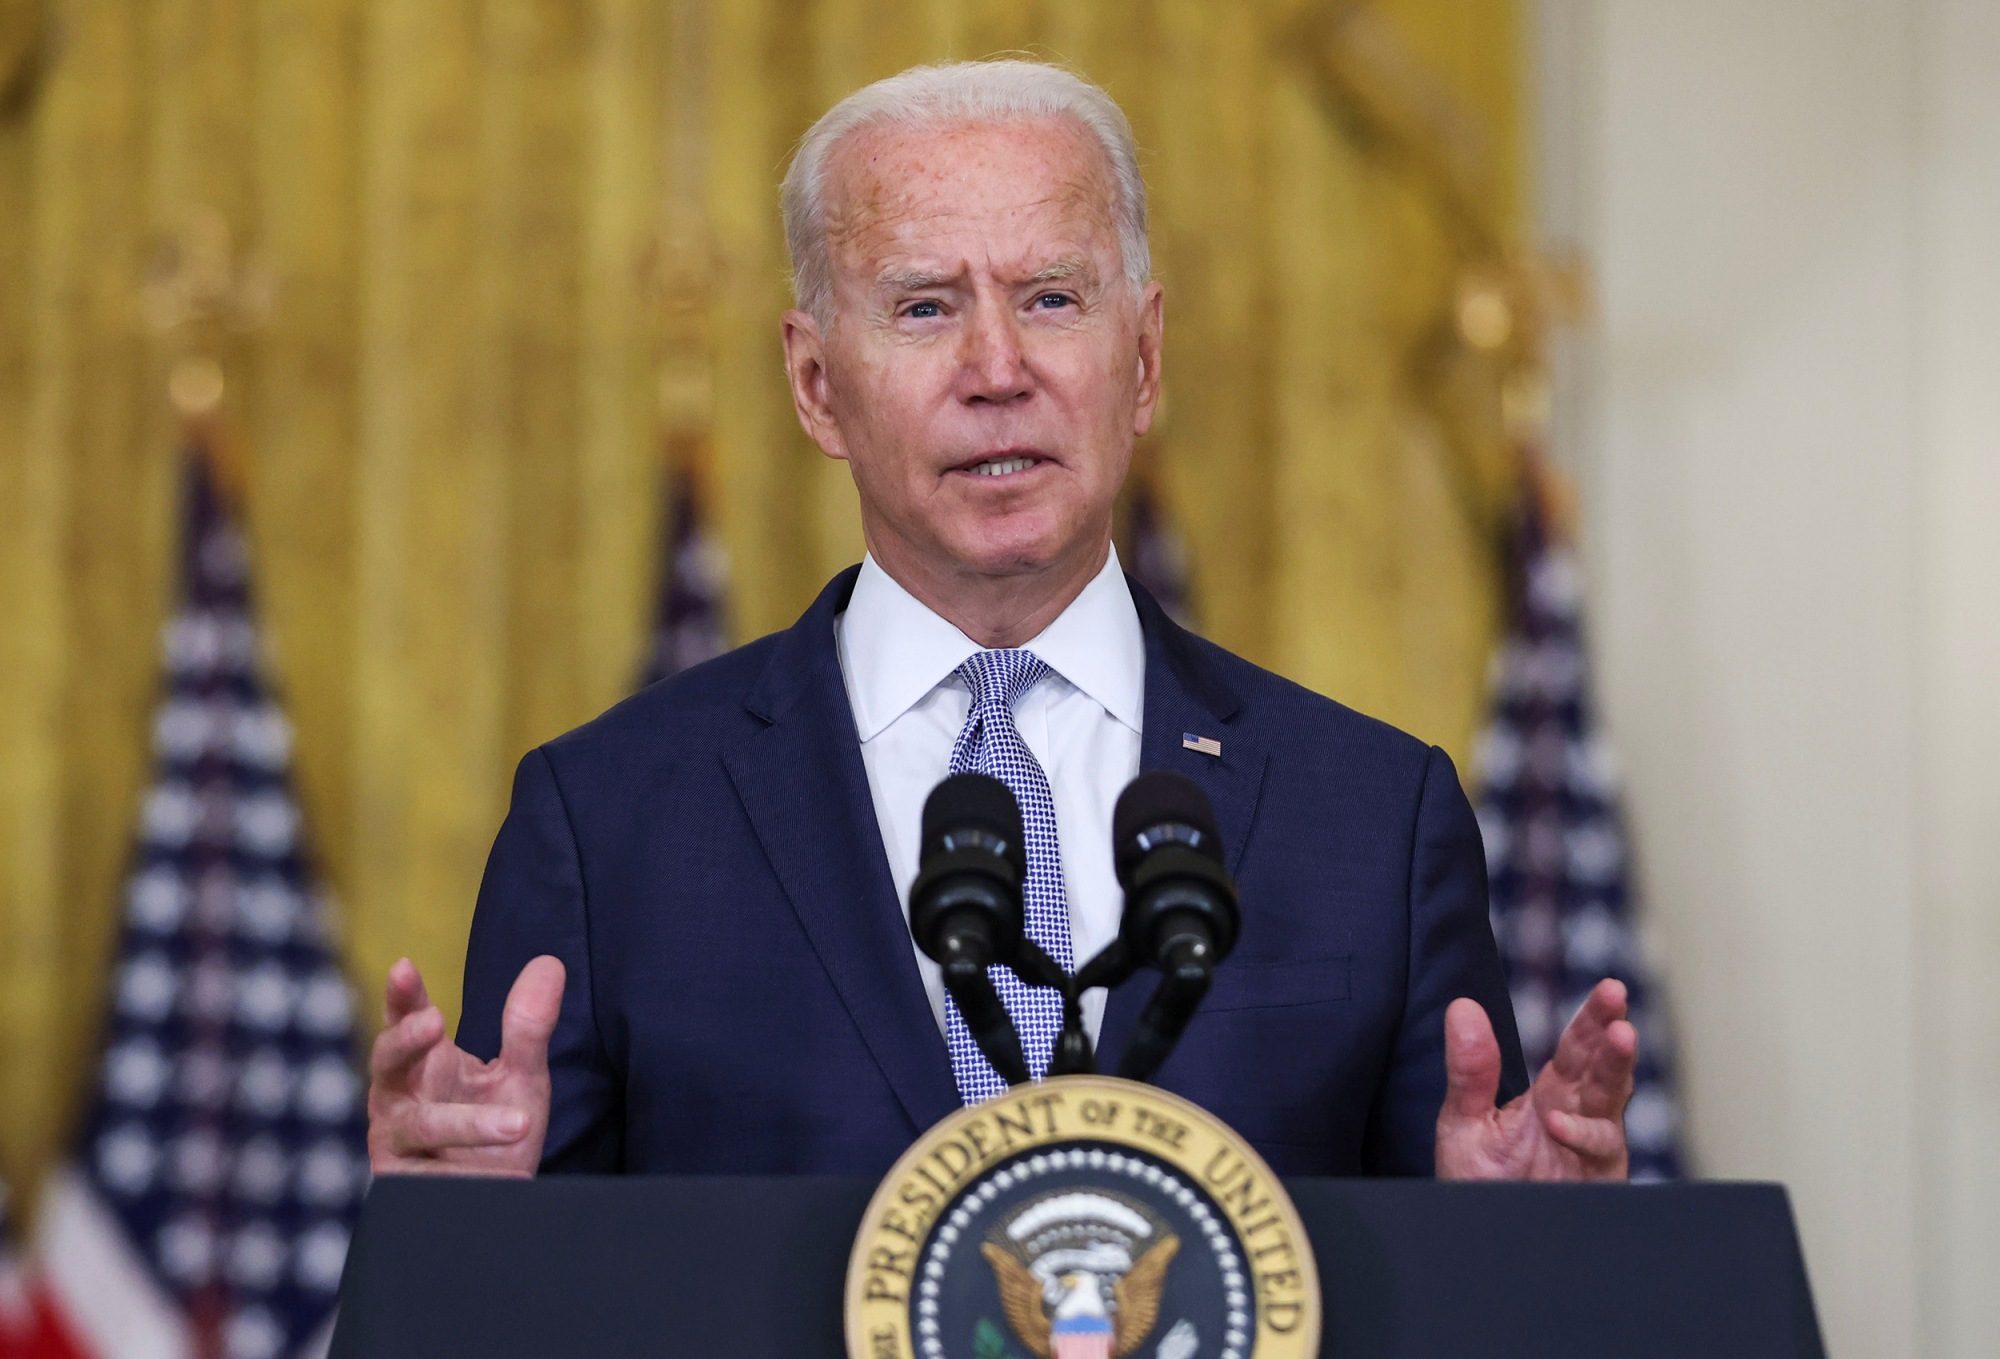 Over 20 organizations demand Biden 'redouble' efforts to fight anti-Asian bias